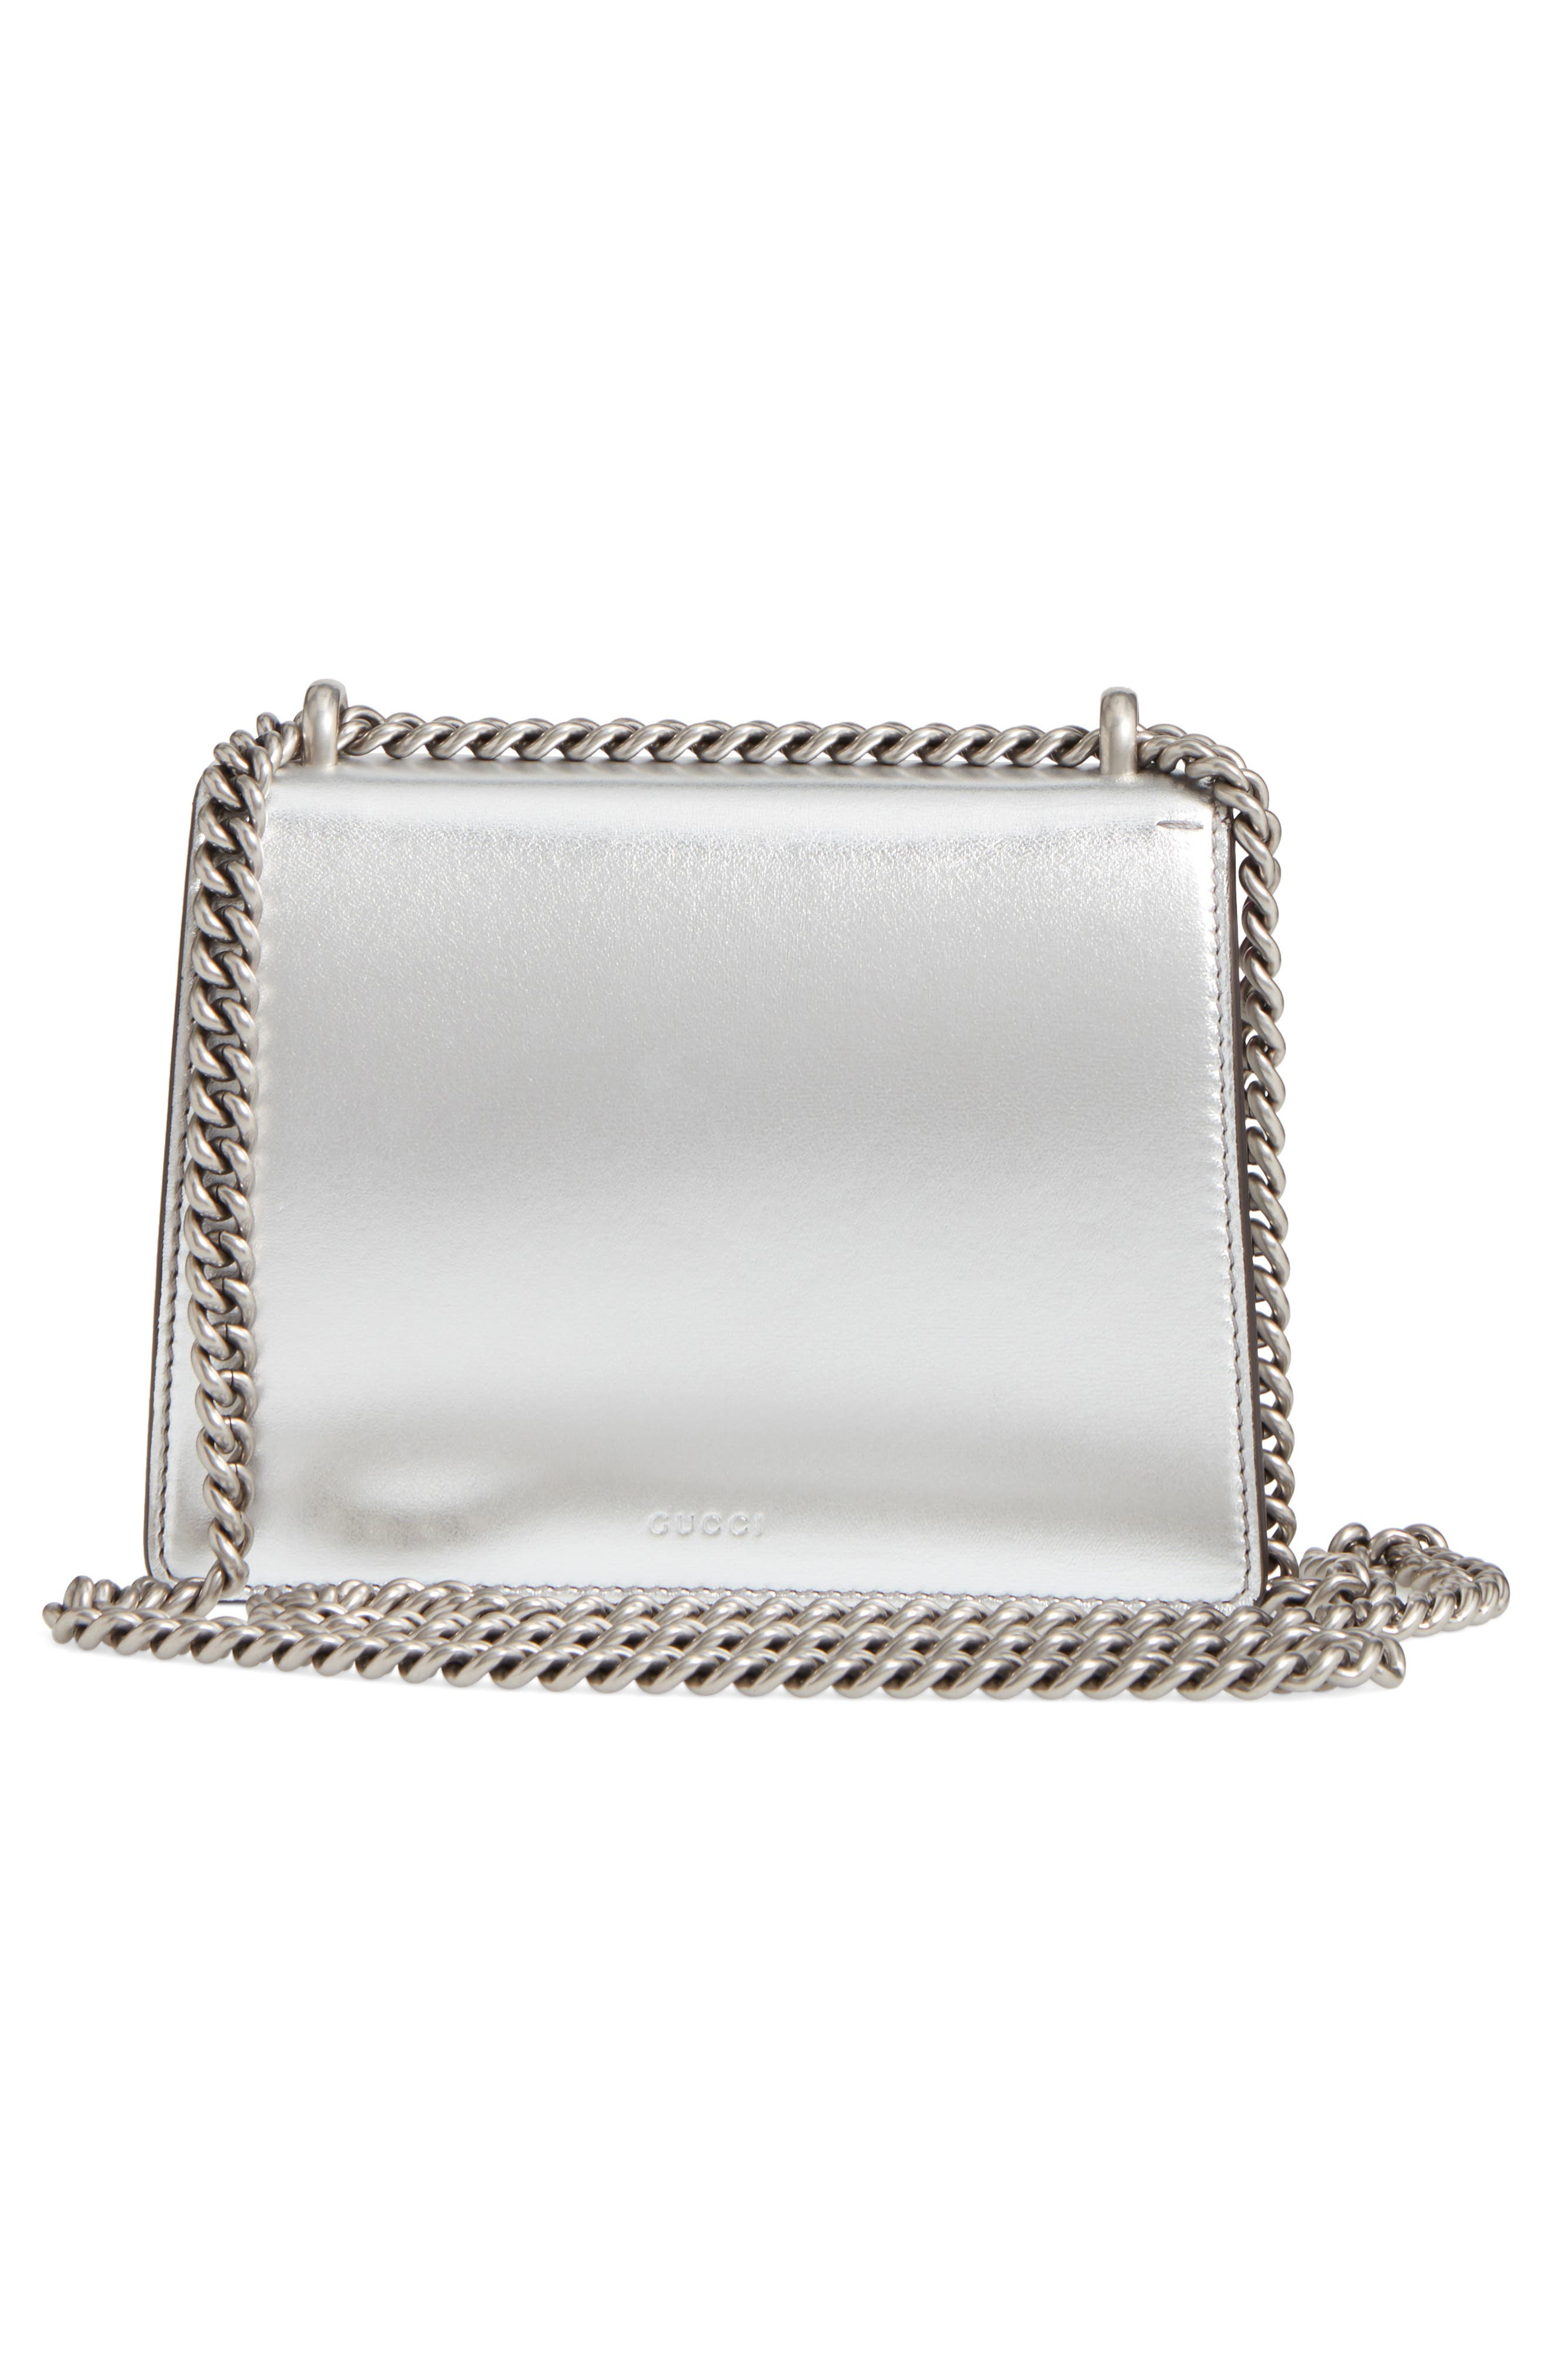 Mini Dionysus Metallic Leather Shoulder Bag,                             Alternate thumbnail 3, color,                             045